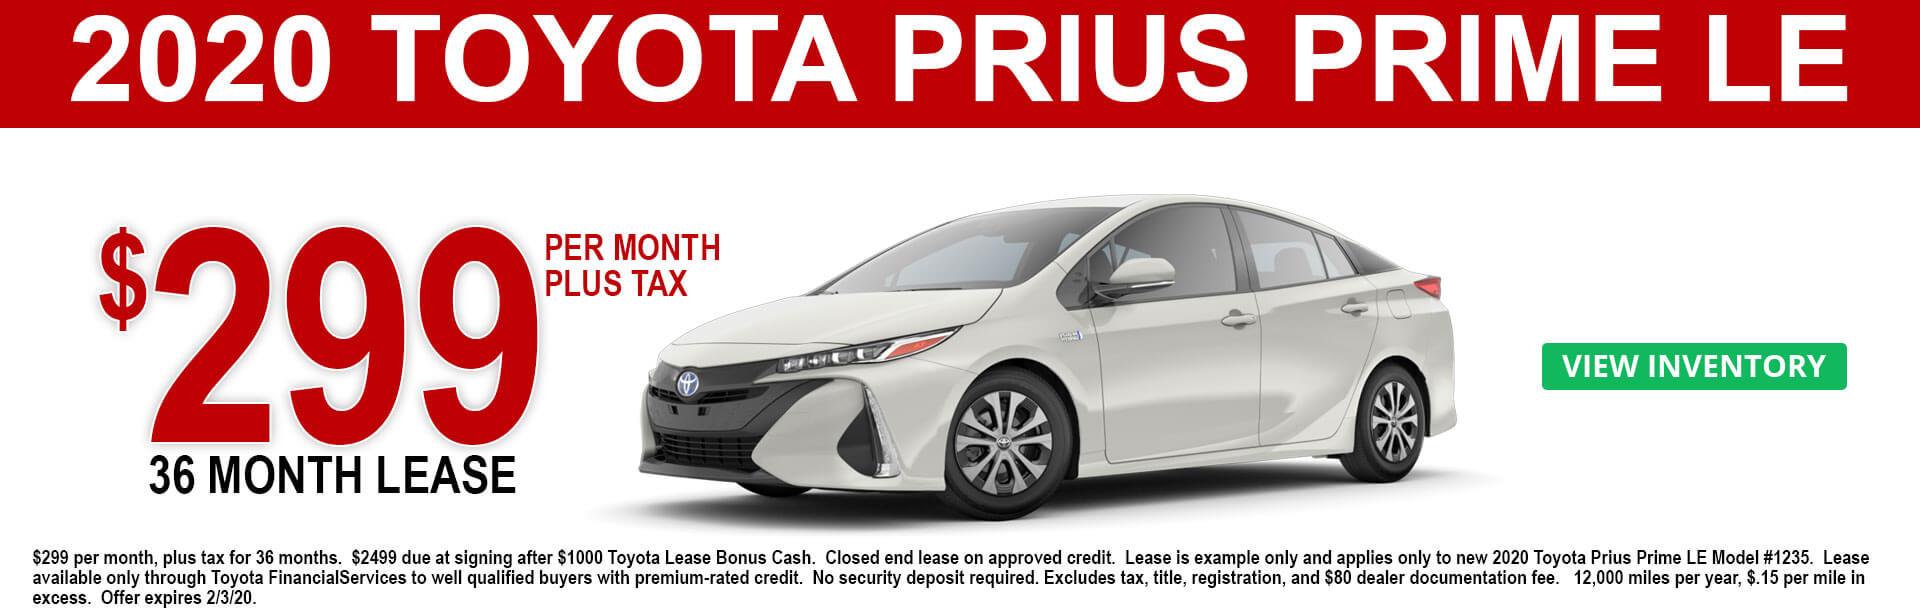 2020 Toyota Prius Prime LE Lease Offer $299 per month